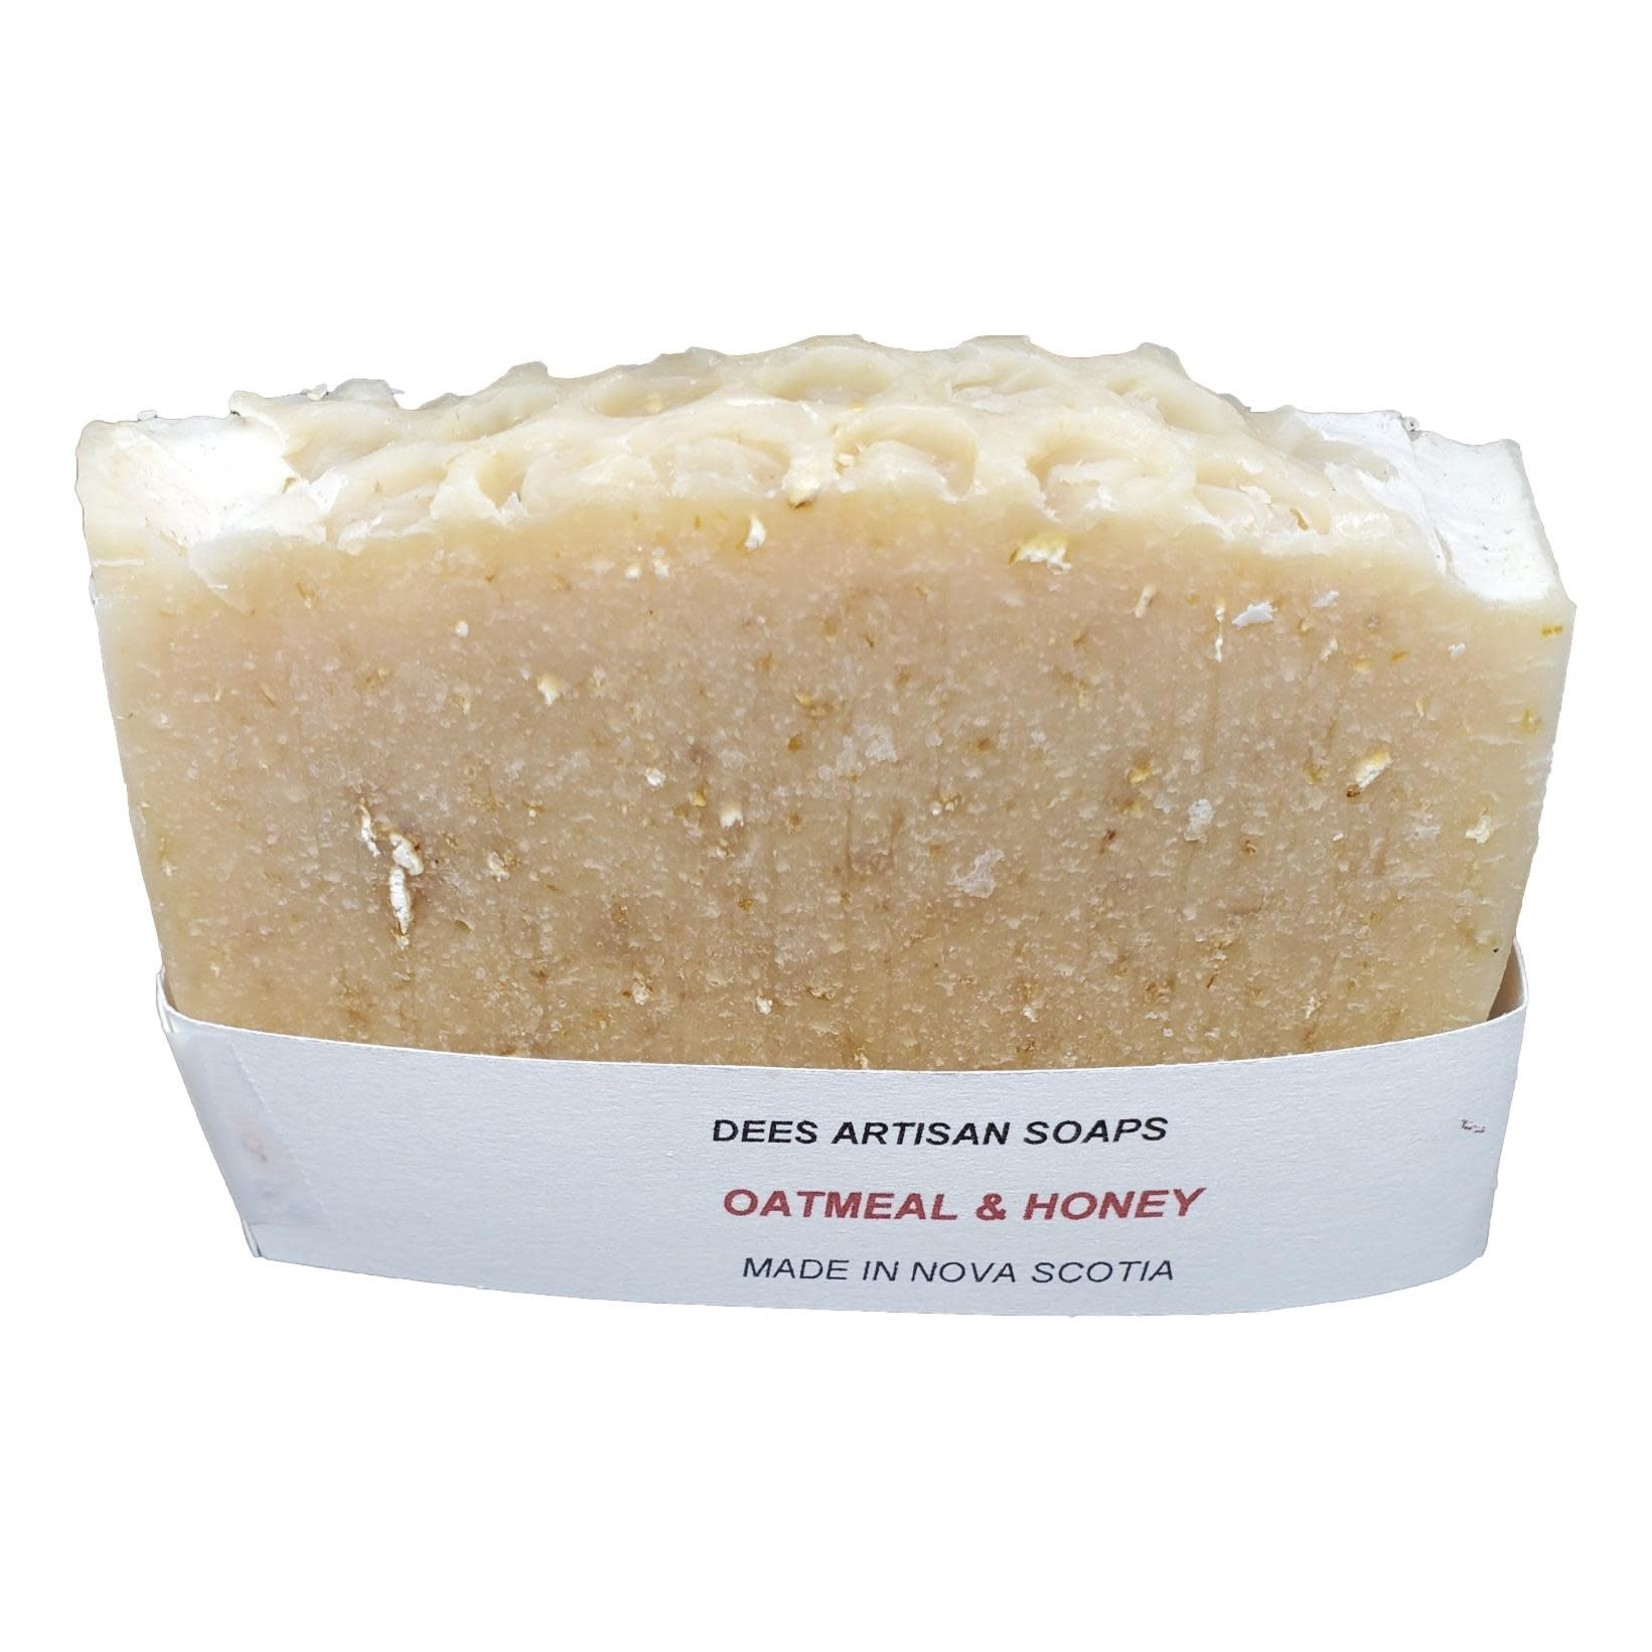 Dee's Artisan Soaps and More Homemade Oatmeal & Honey Soap